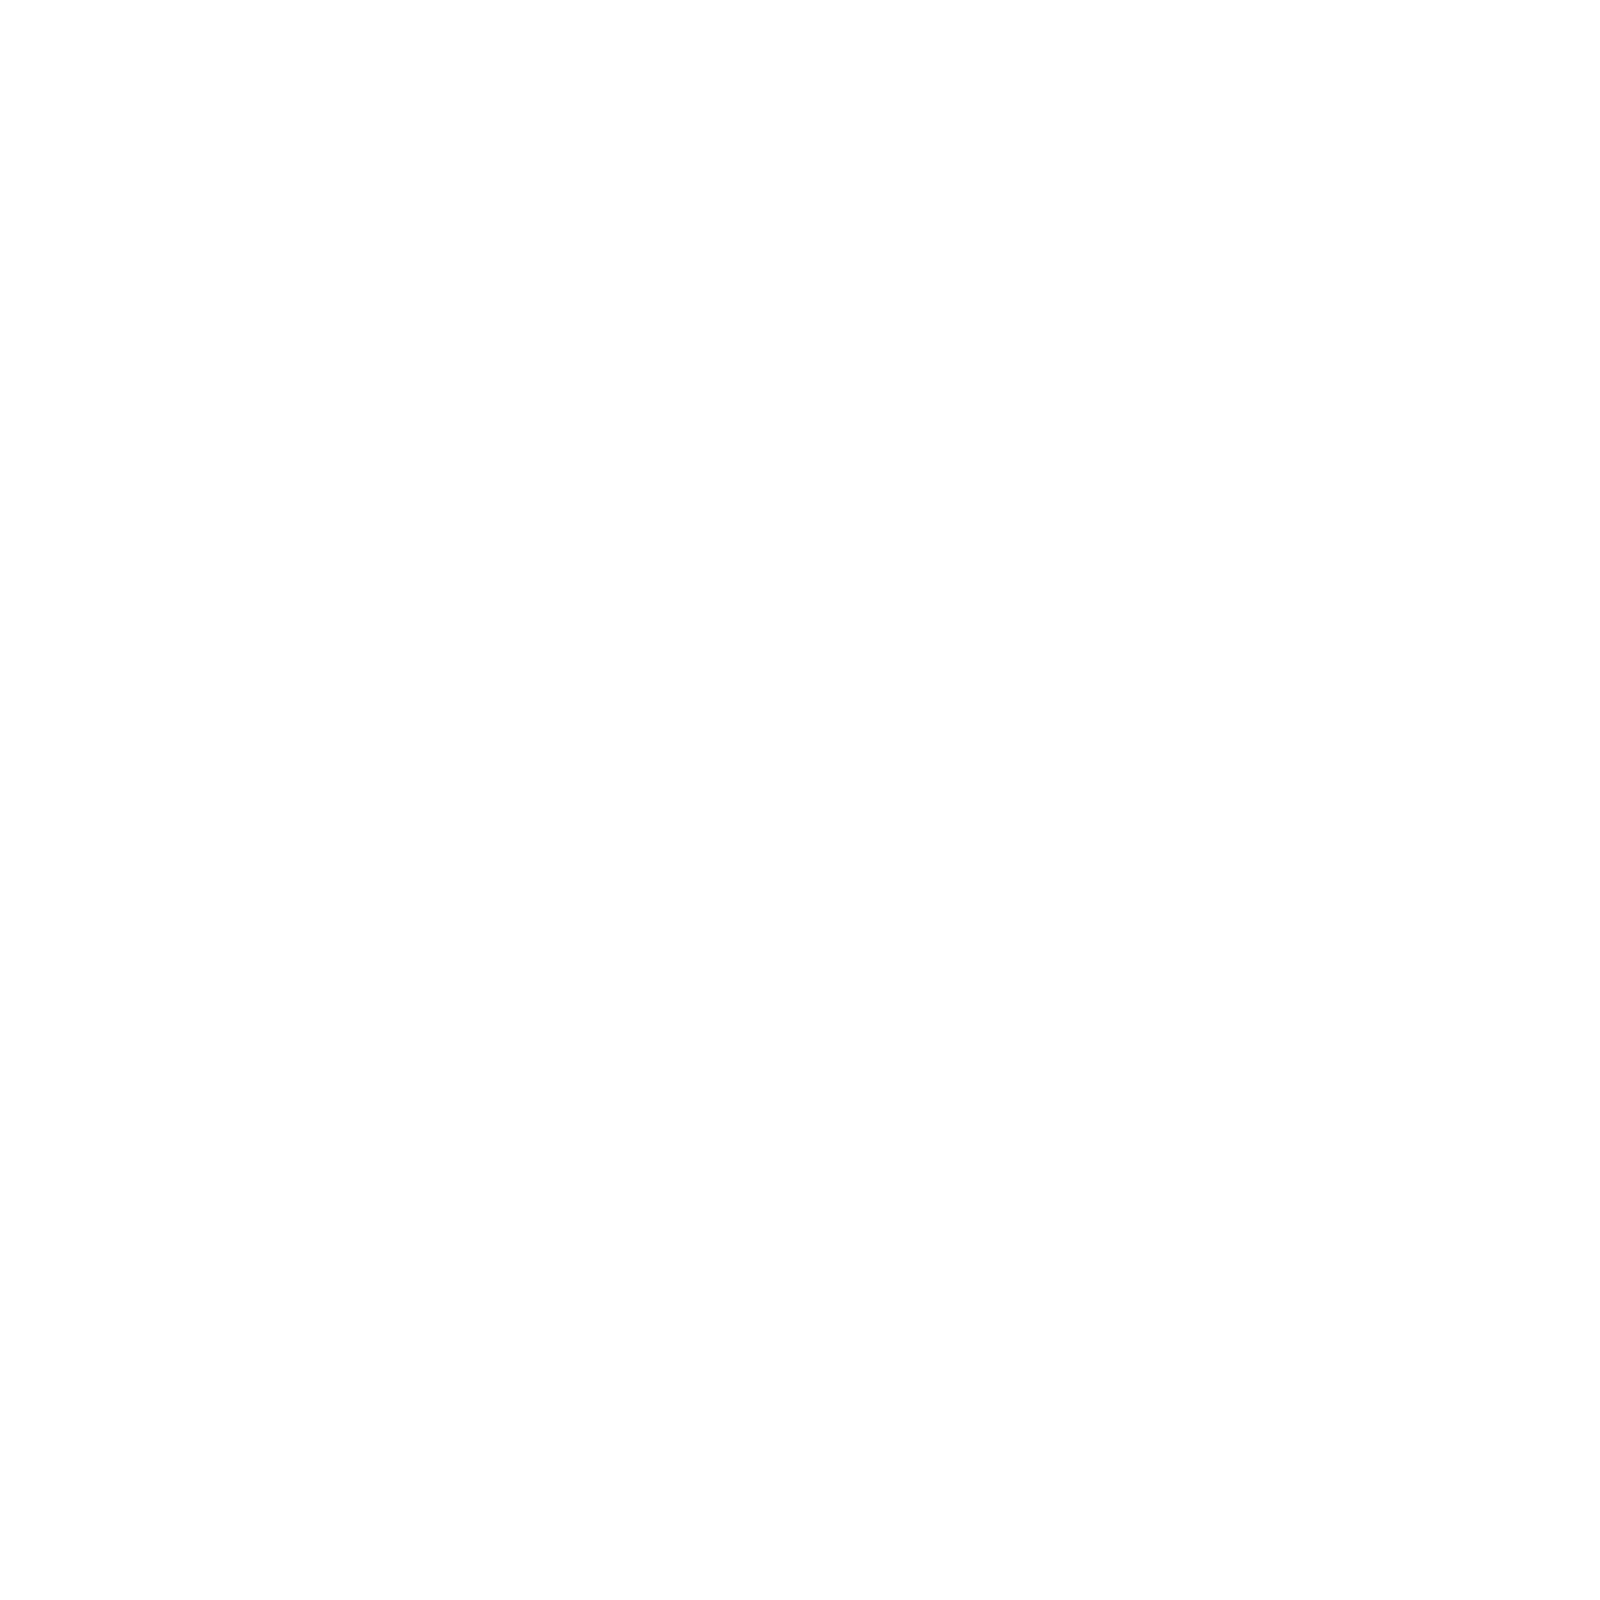 nimble-project-logo